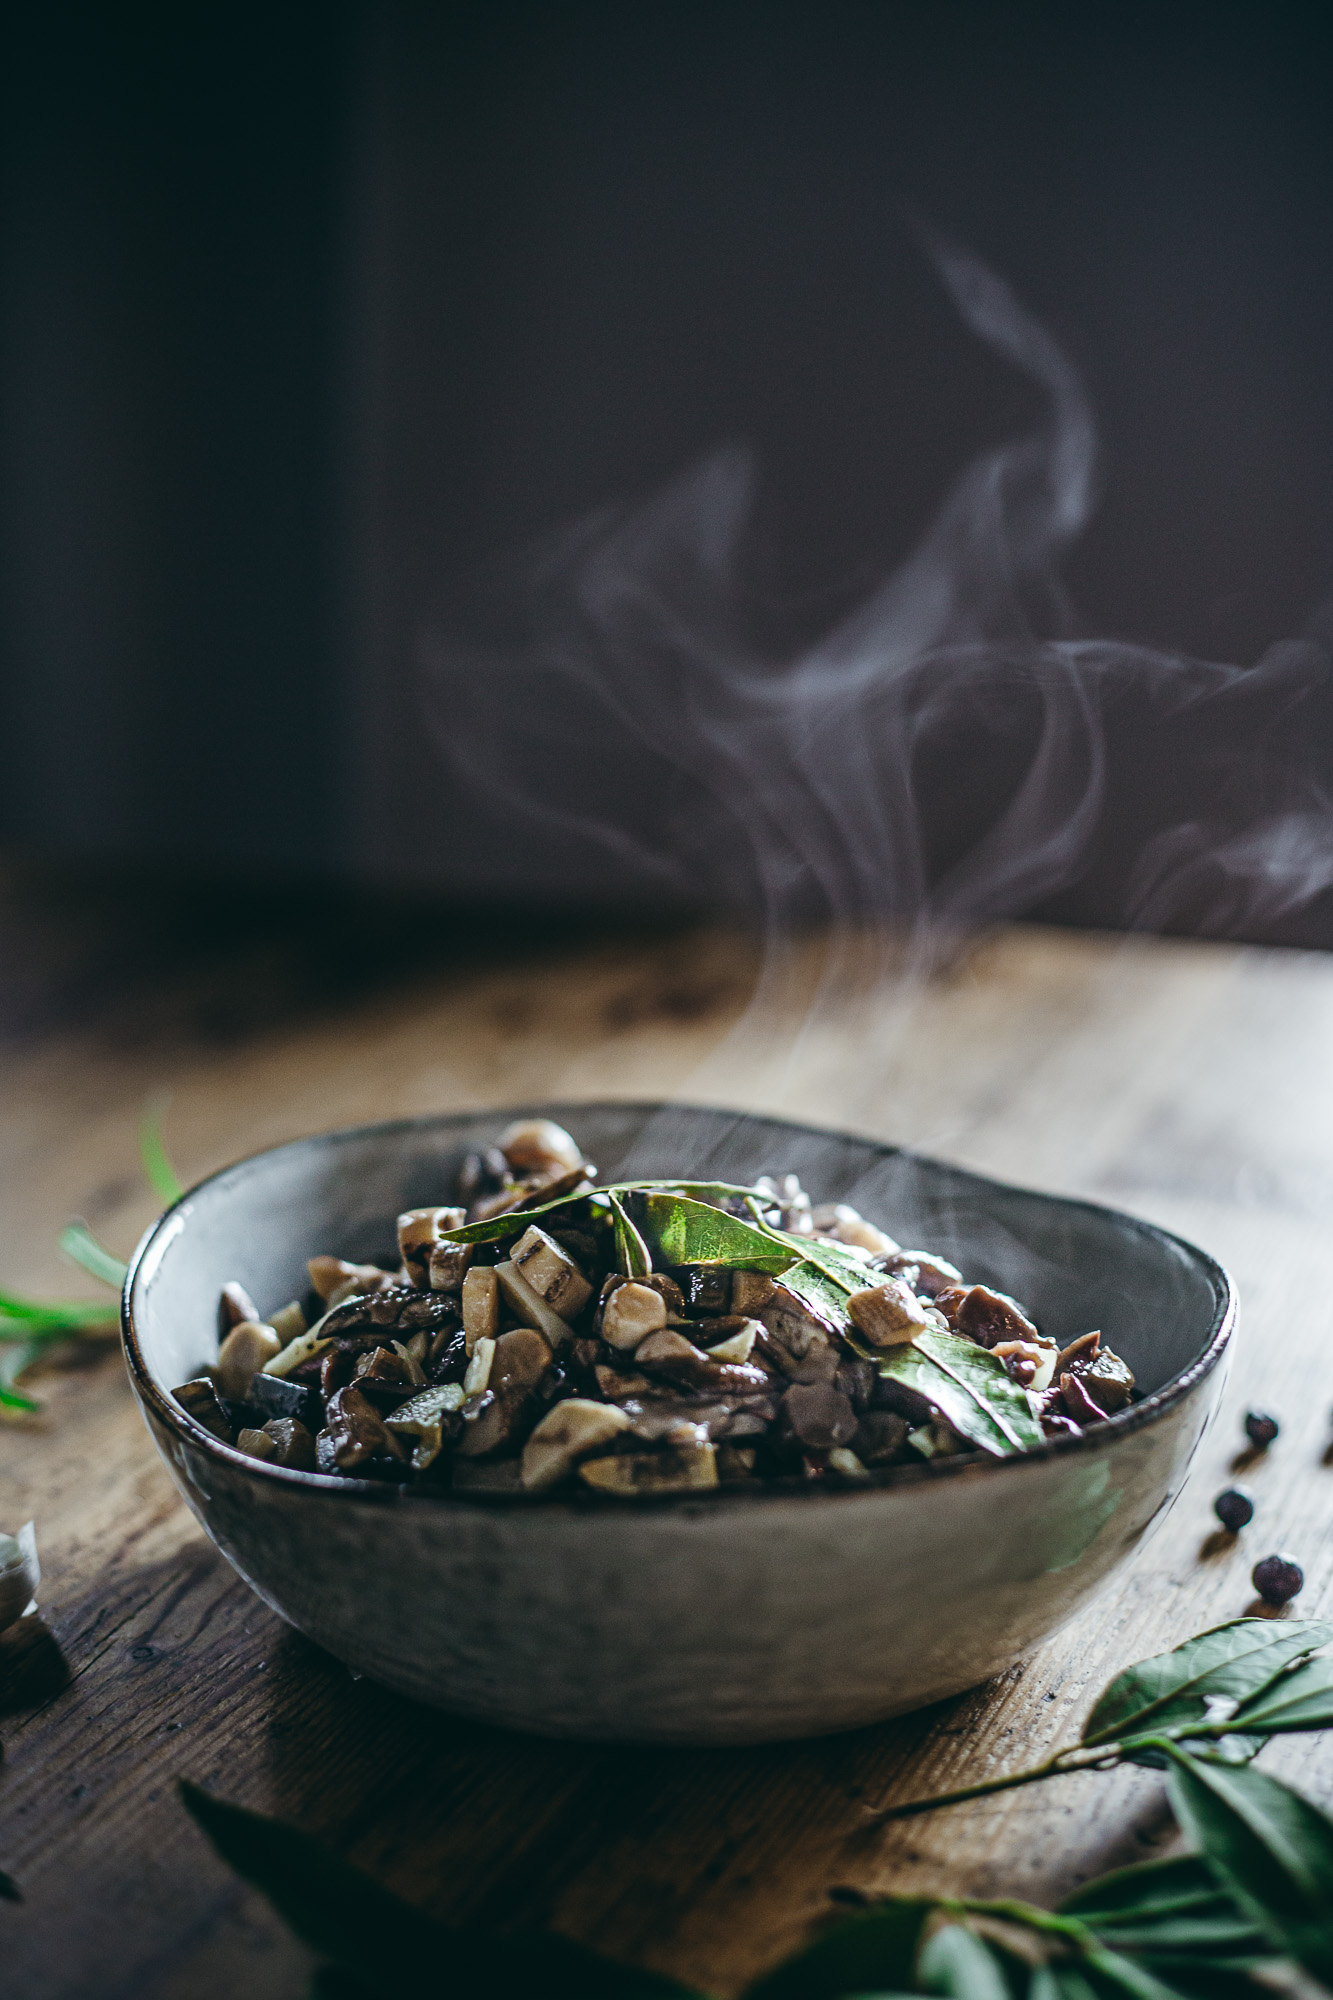 Pickled mushrooms in olive oil - Nordic Foraging - The Adagio Blog